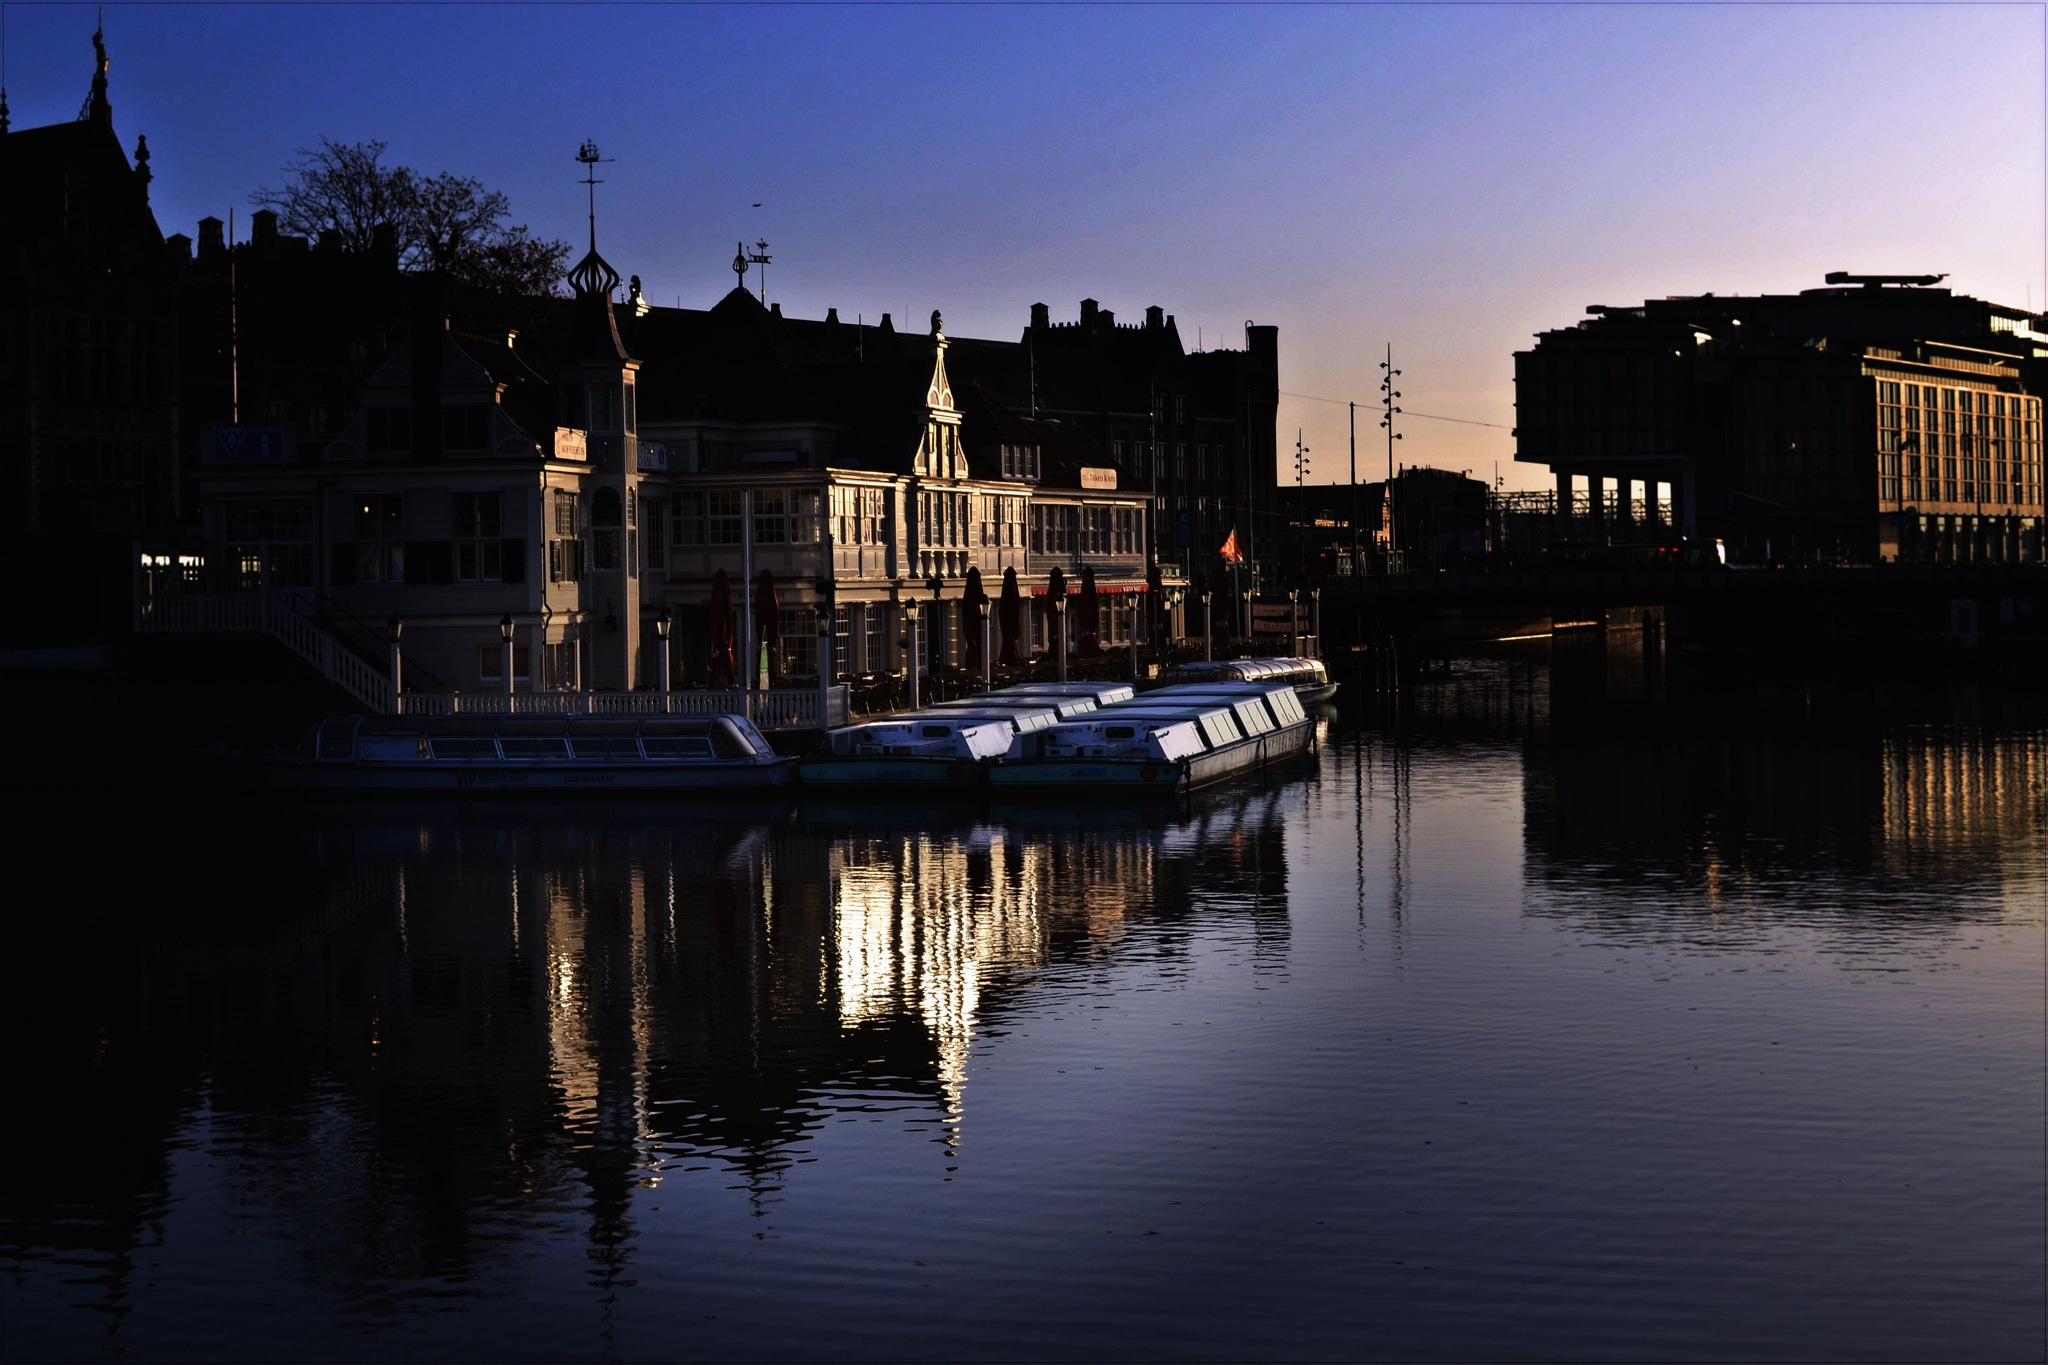 Poente em Amsterdam  by Fred Matos